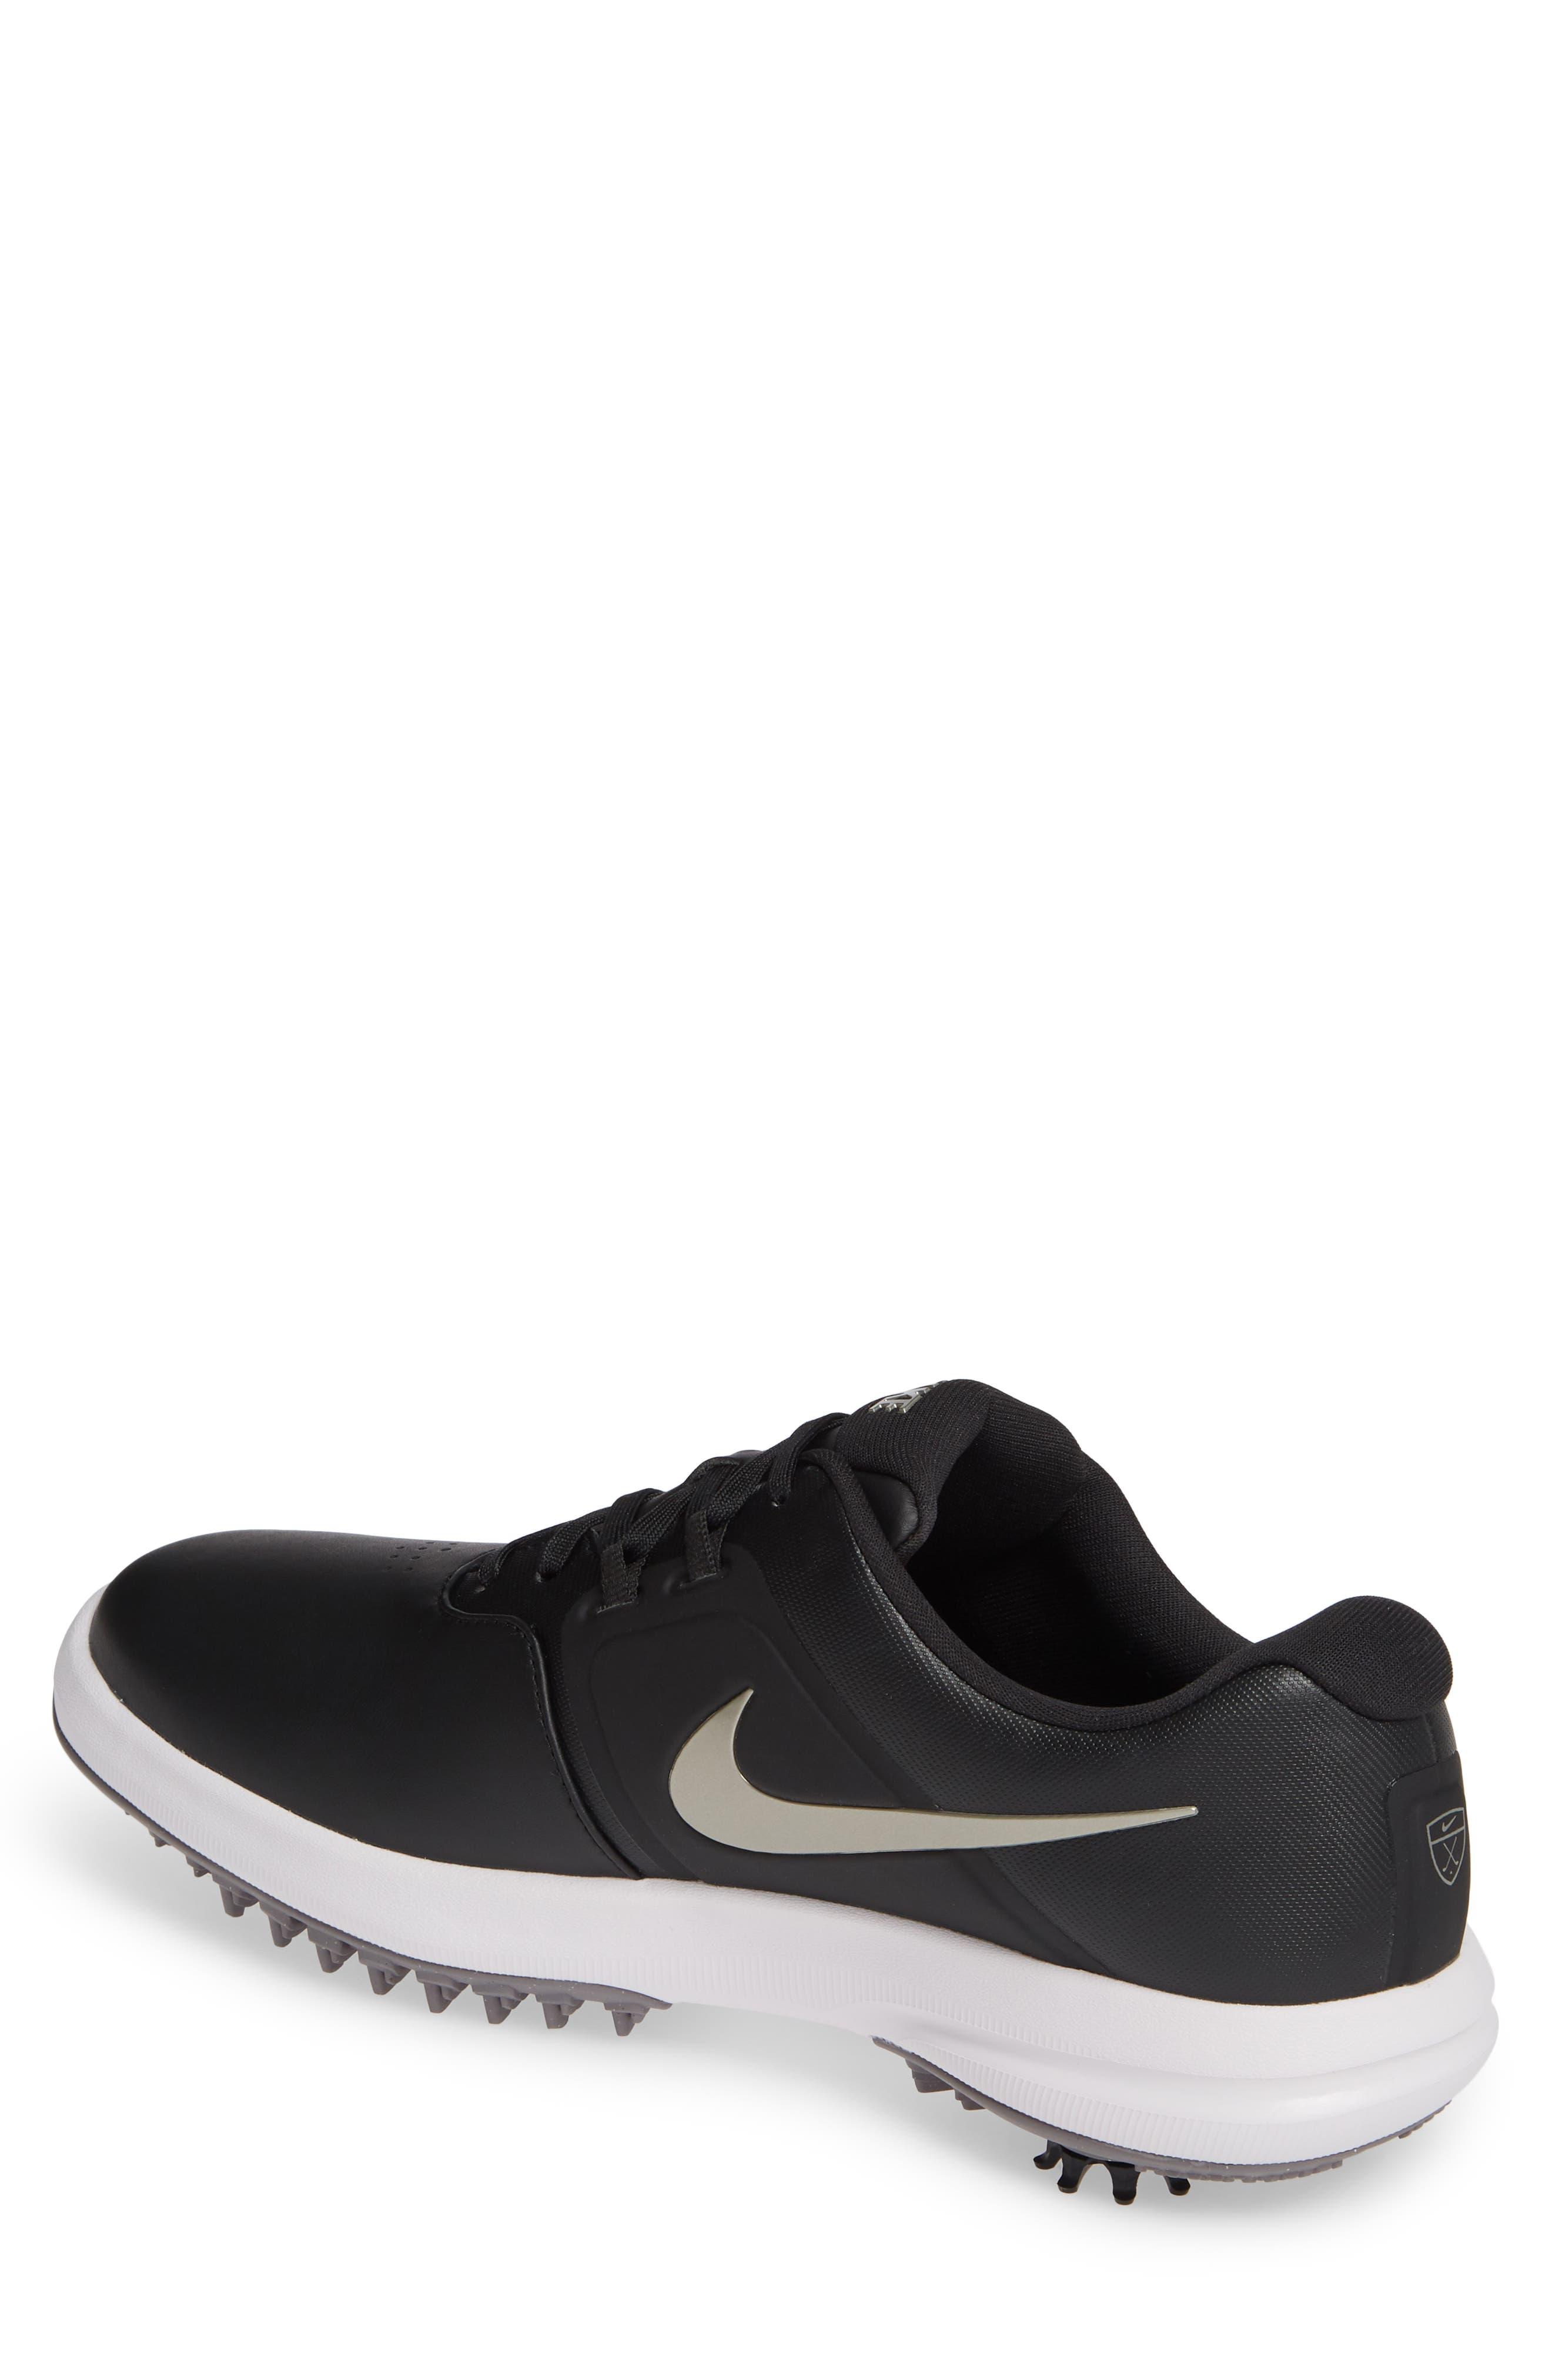 NIKE, Air Zoom Victory Golf Shoe, Alternate thumbnail 2, color, BLACK/ PEWTER/ VAST GREY